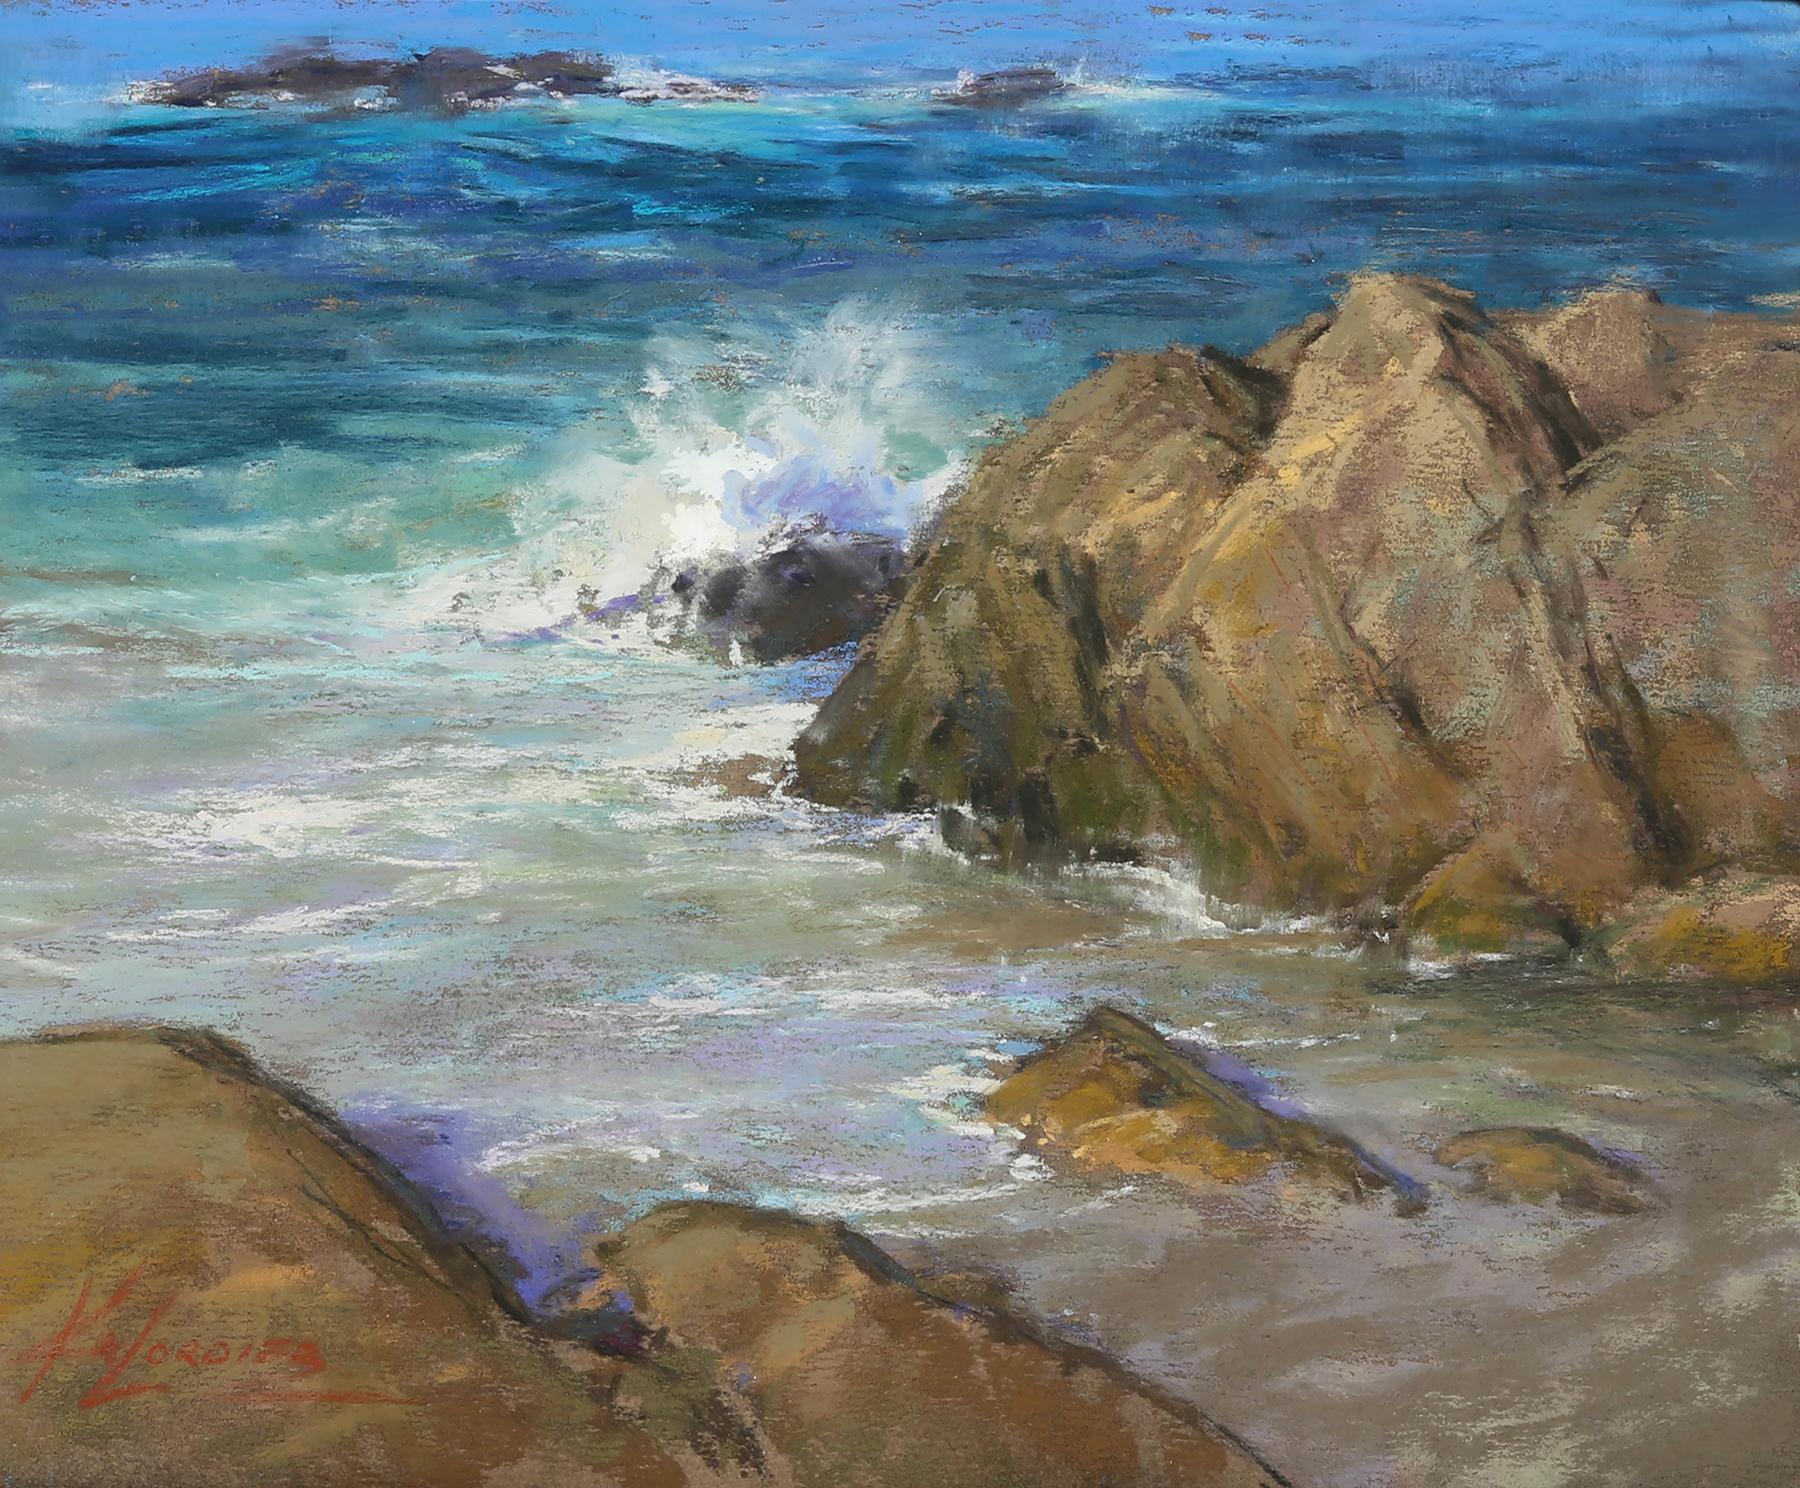 Carmel coastline, ocean splashing against rocks.